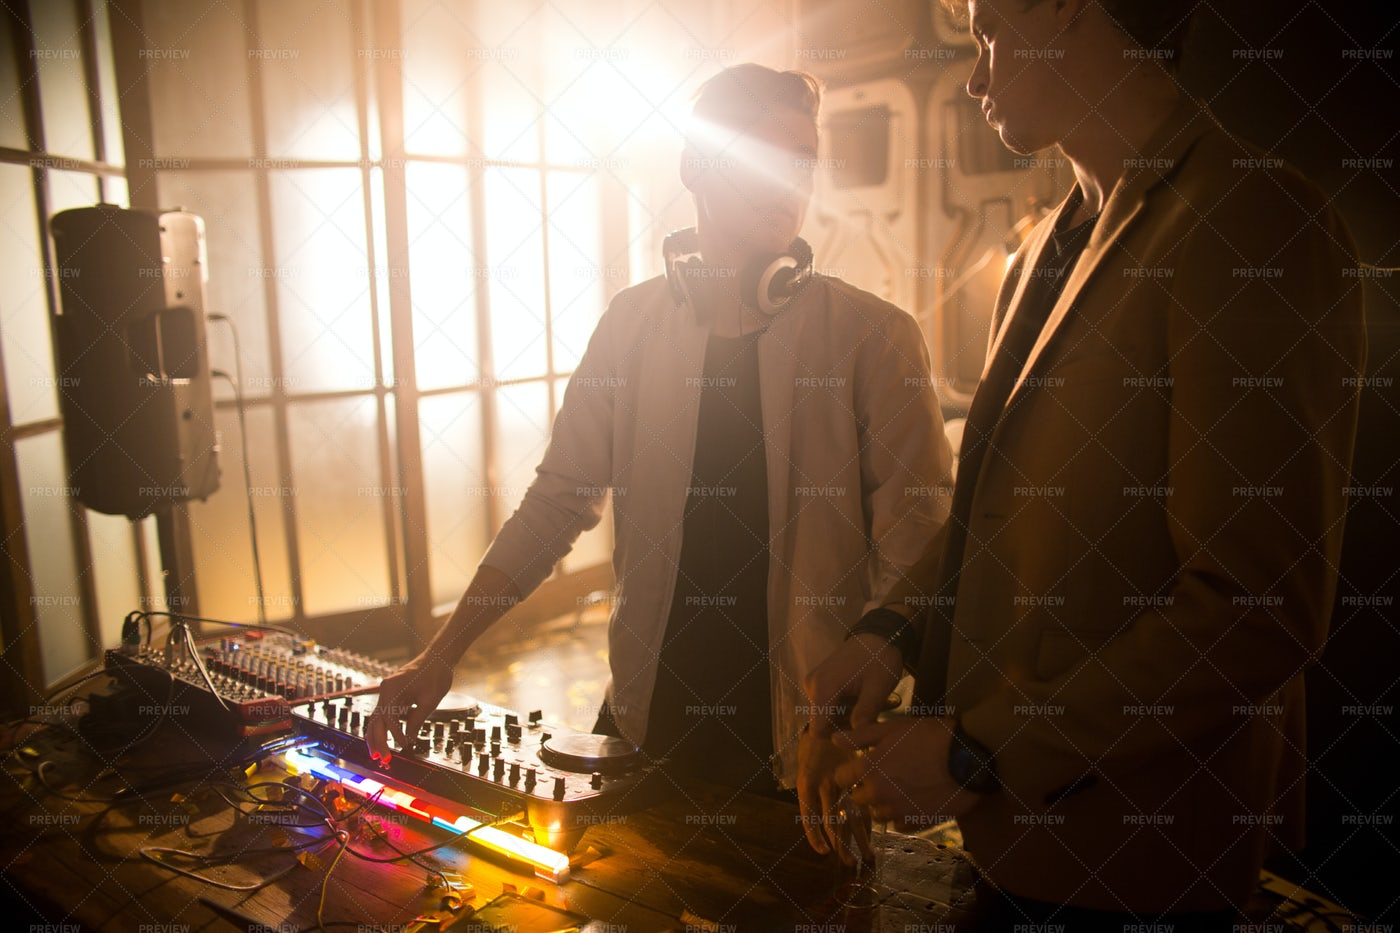 DJ Playing Music In Nightclub: Stock Photos